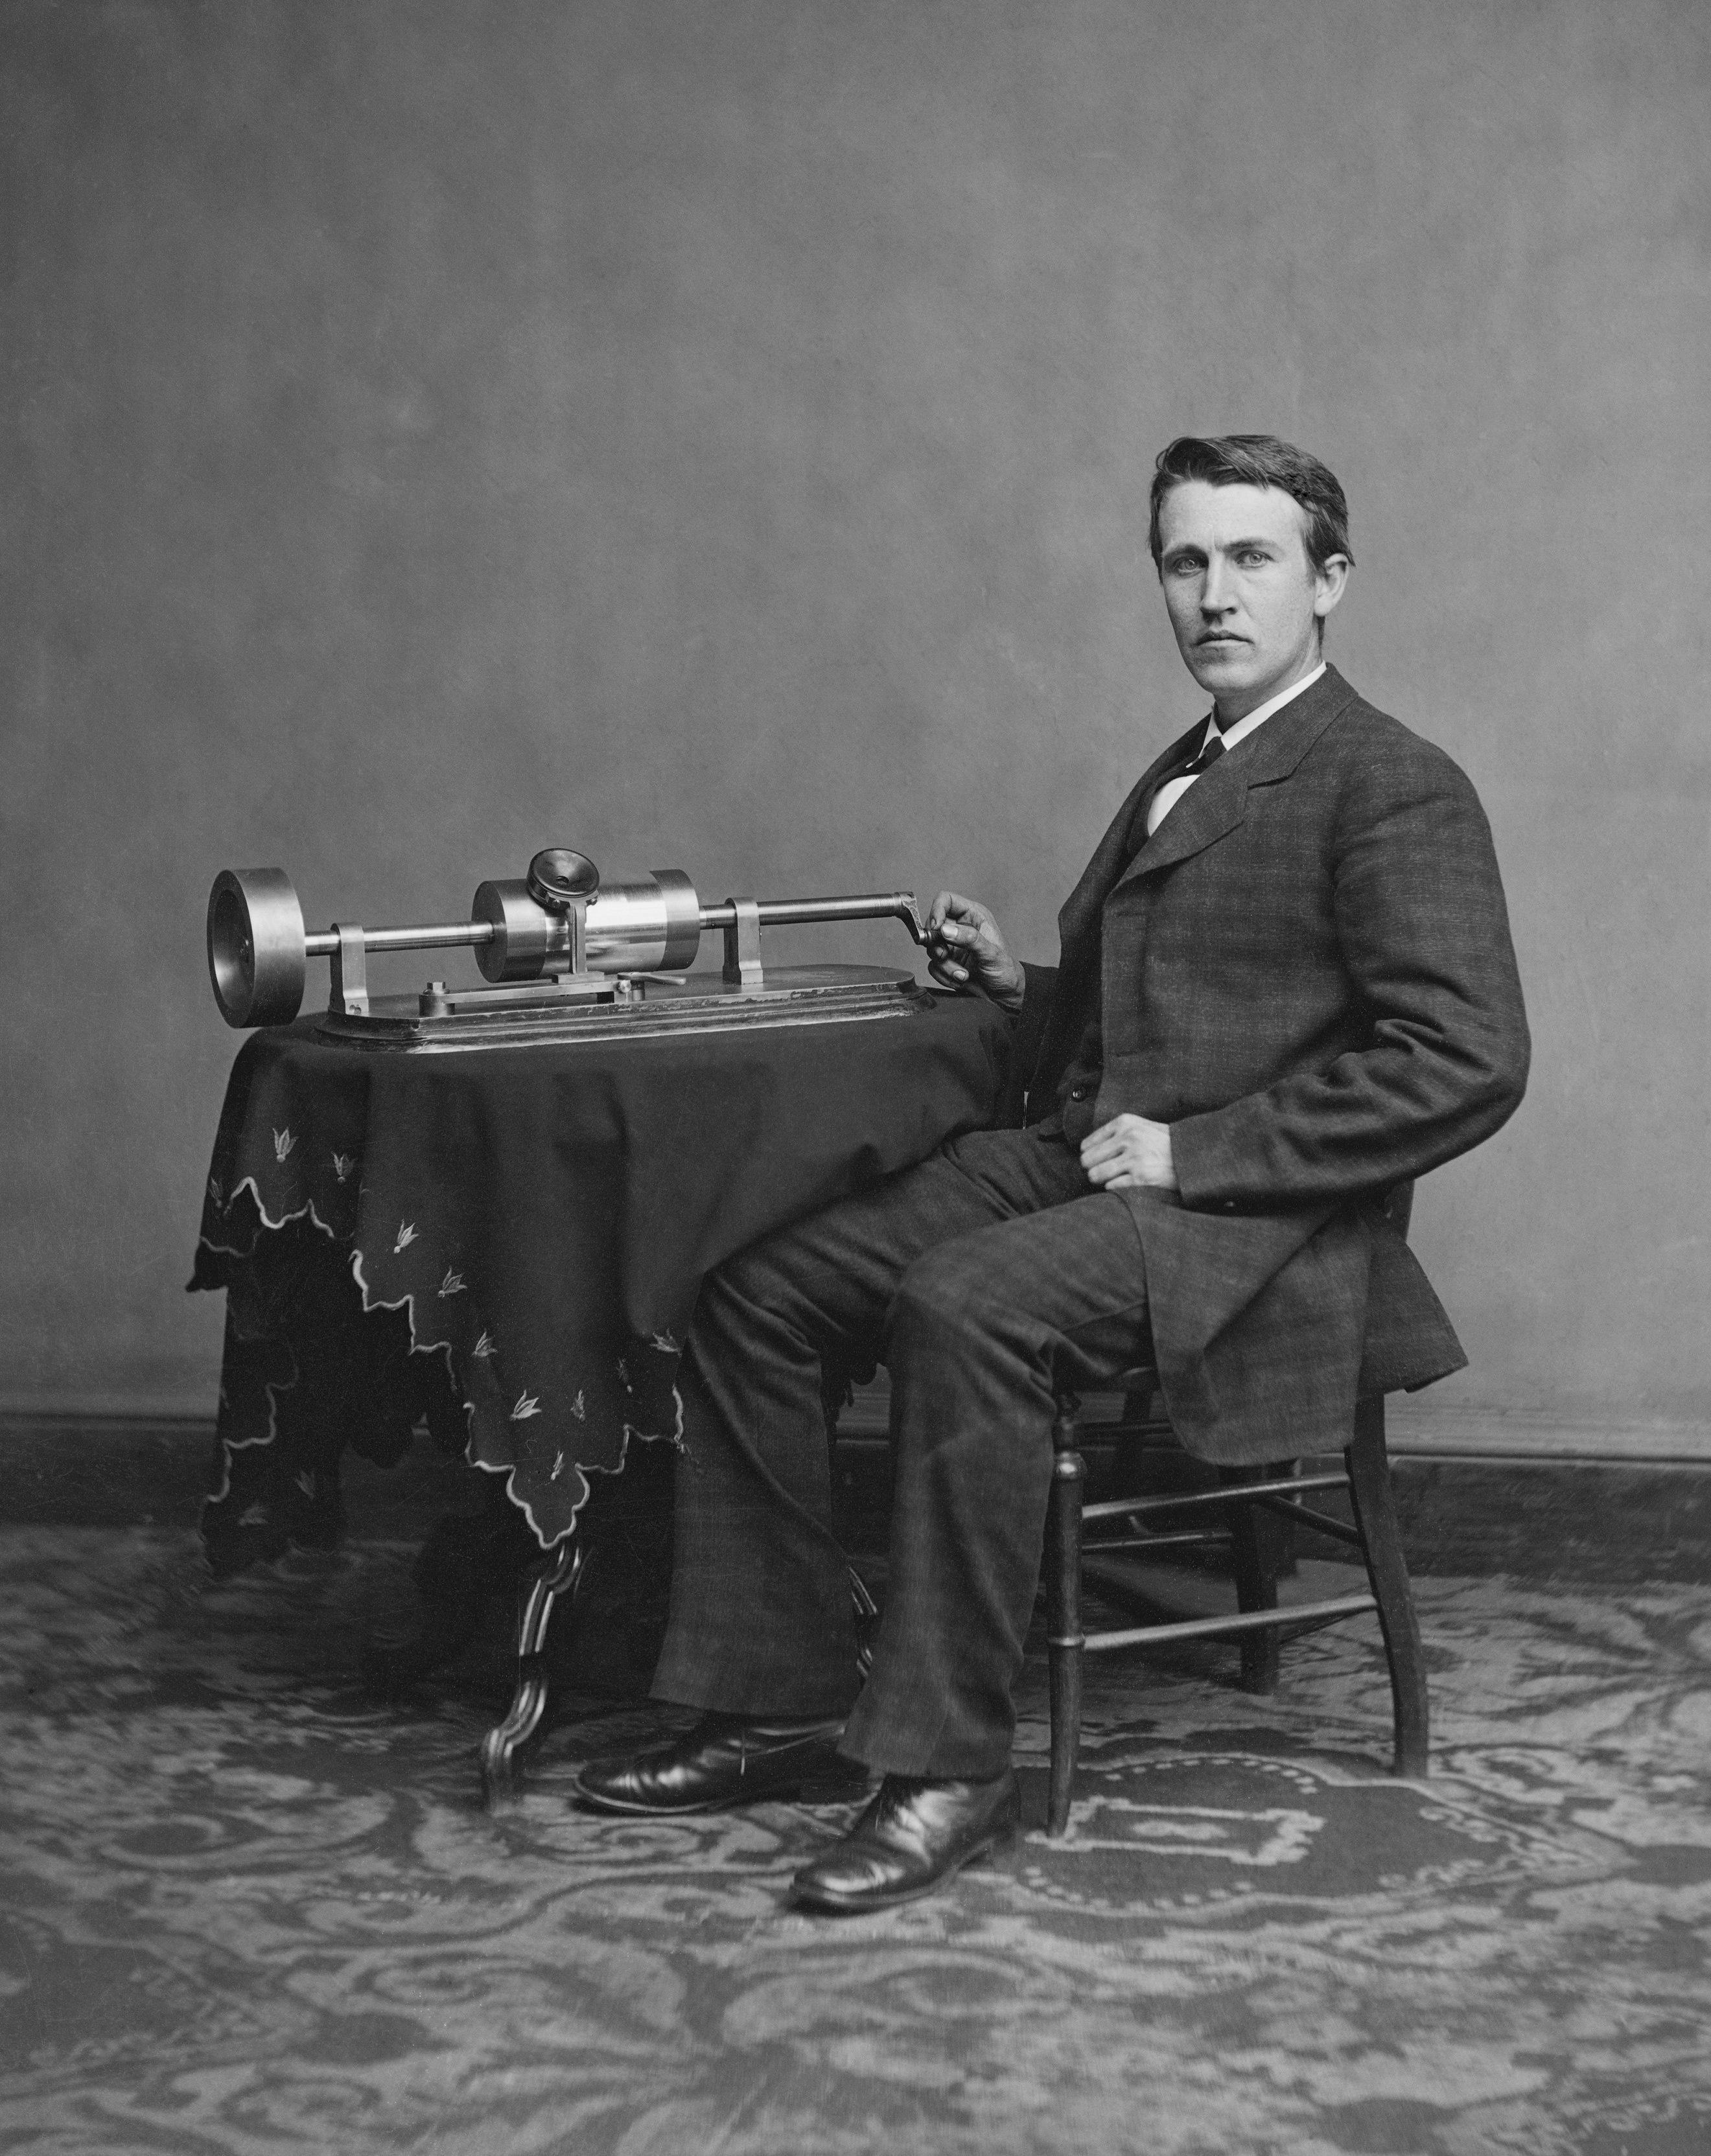 https://upload.wikimedia.org/wikipedia/commons/c/c5/Edison_and_phonograph_edit2.jpg